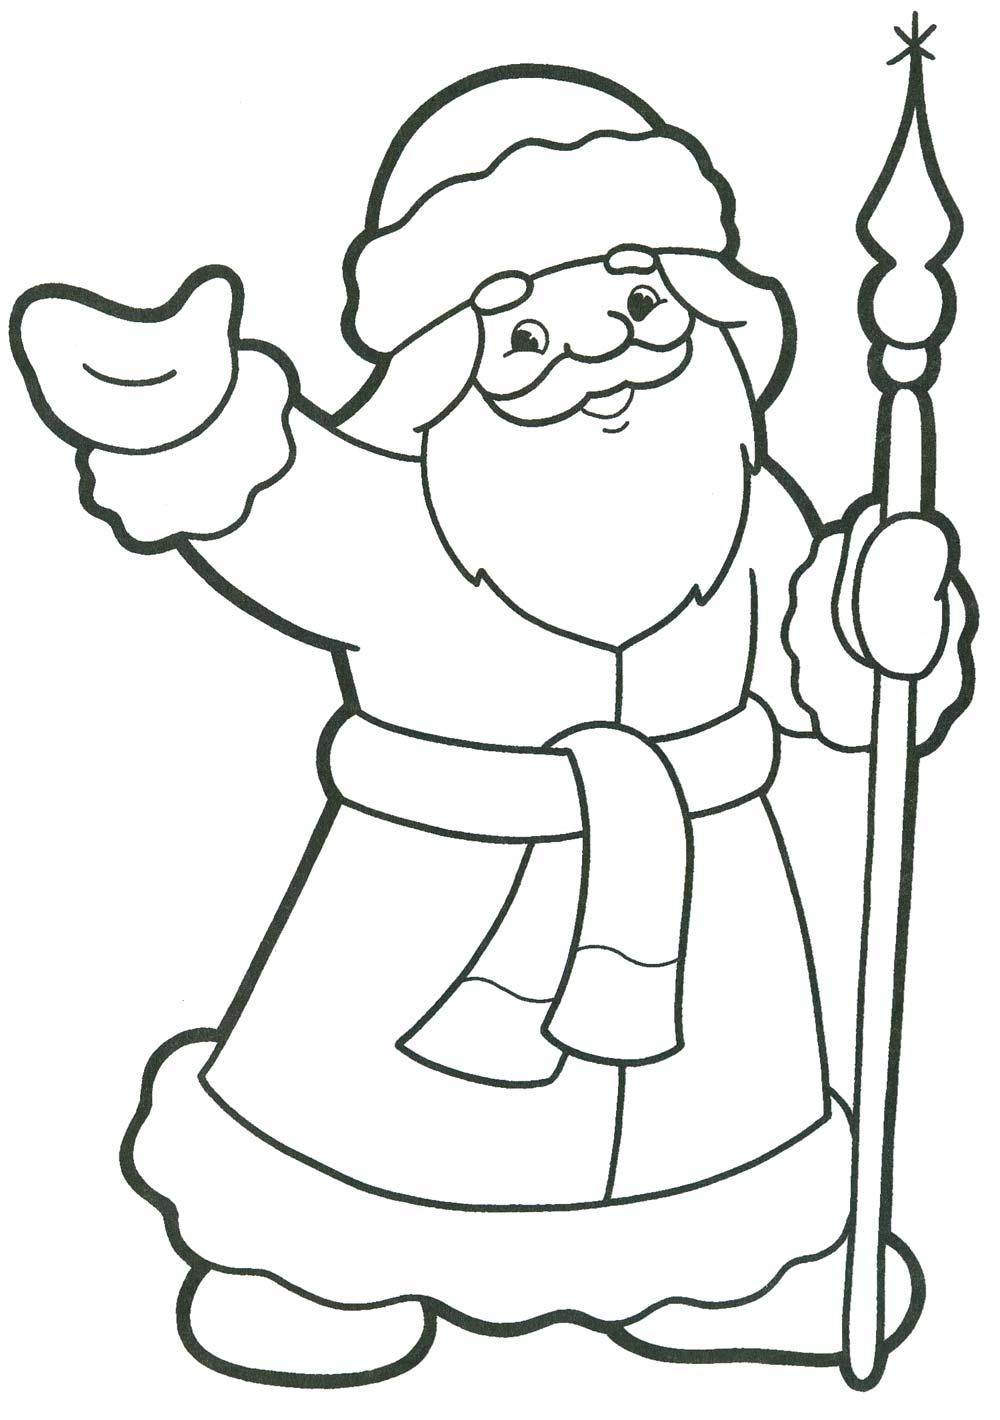 Дед мороз с посохом Раскраска зима пришла